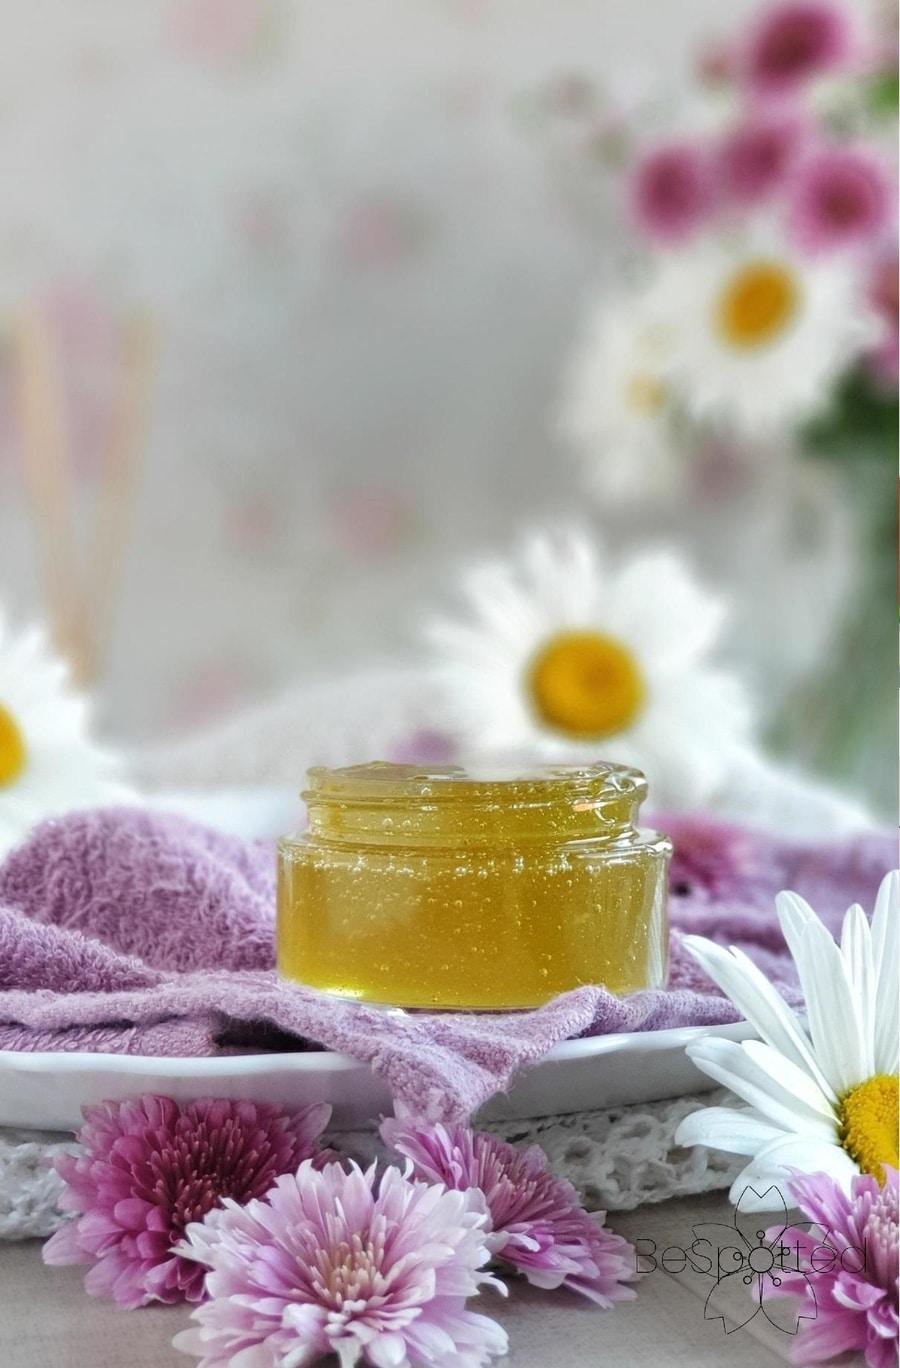 Homemade aloe and honey face mask